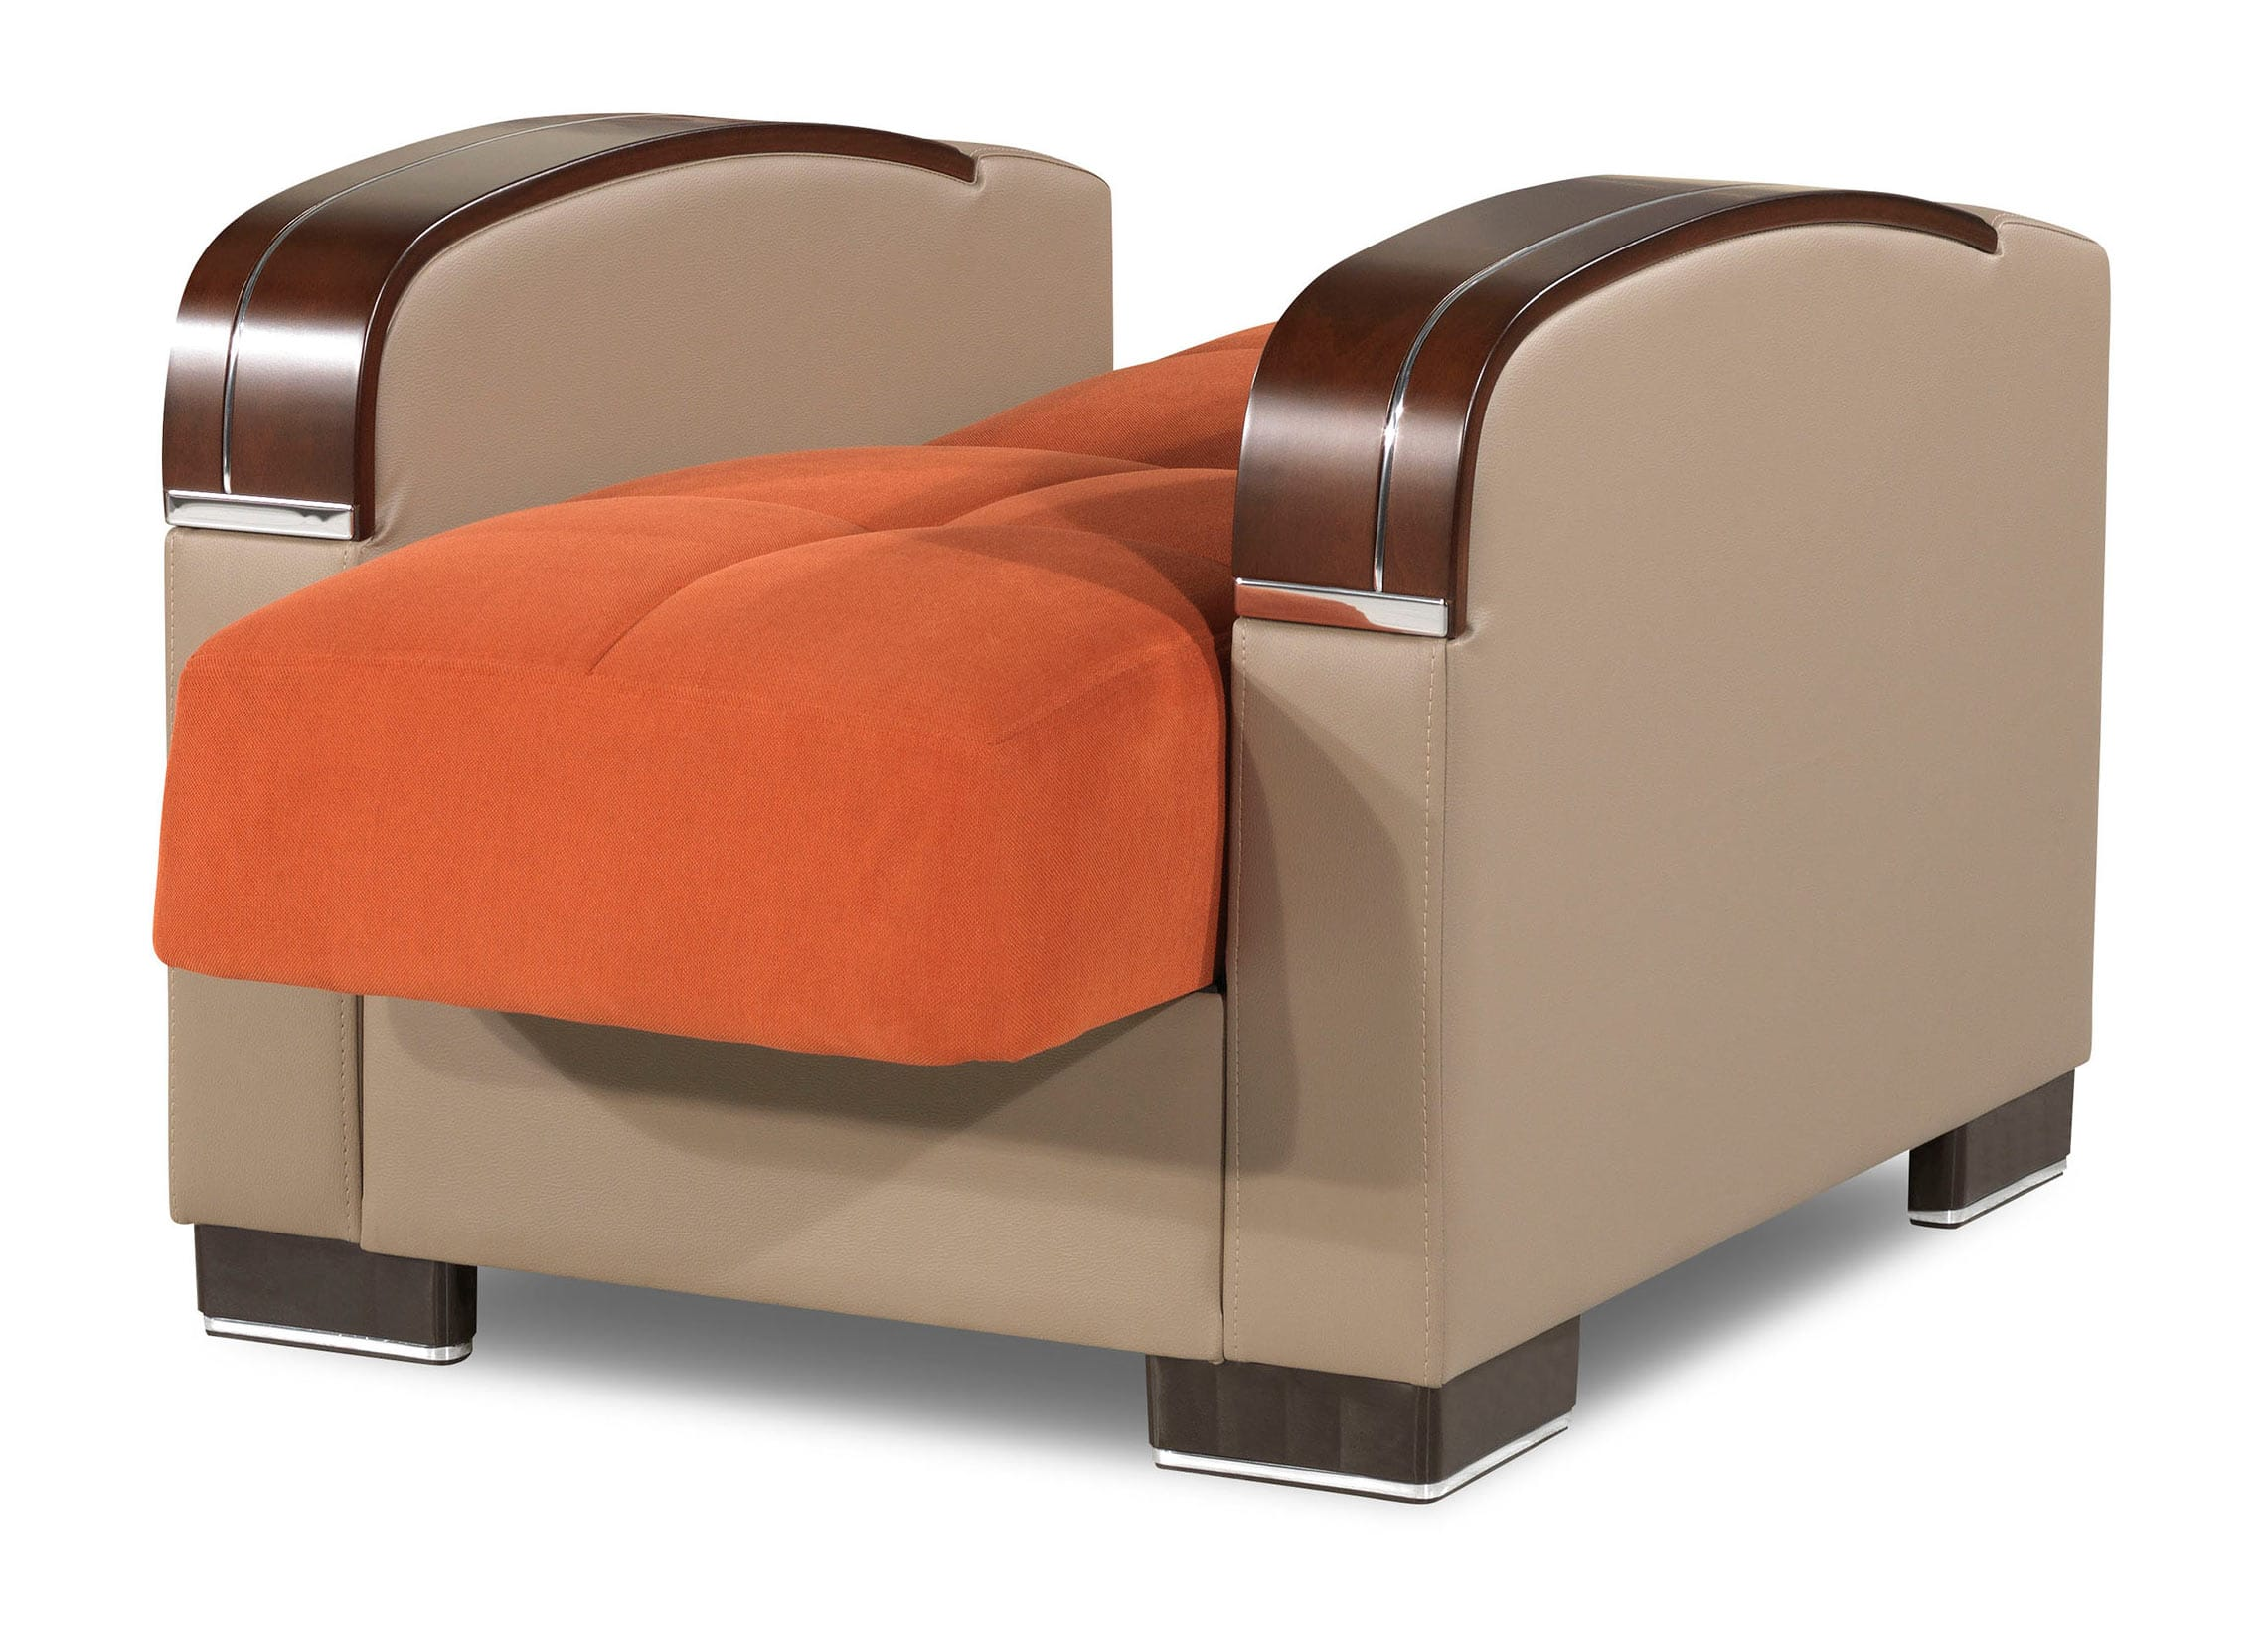 Tremendous Mobimax Orange Chair By Casamode Inzonedesignstudio Interior Chair Design Inzonedesignstudiocom